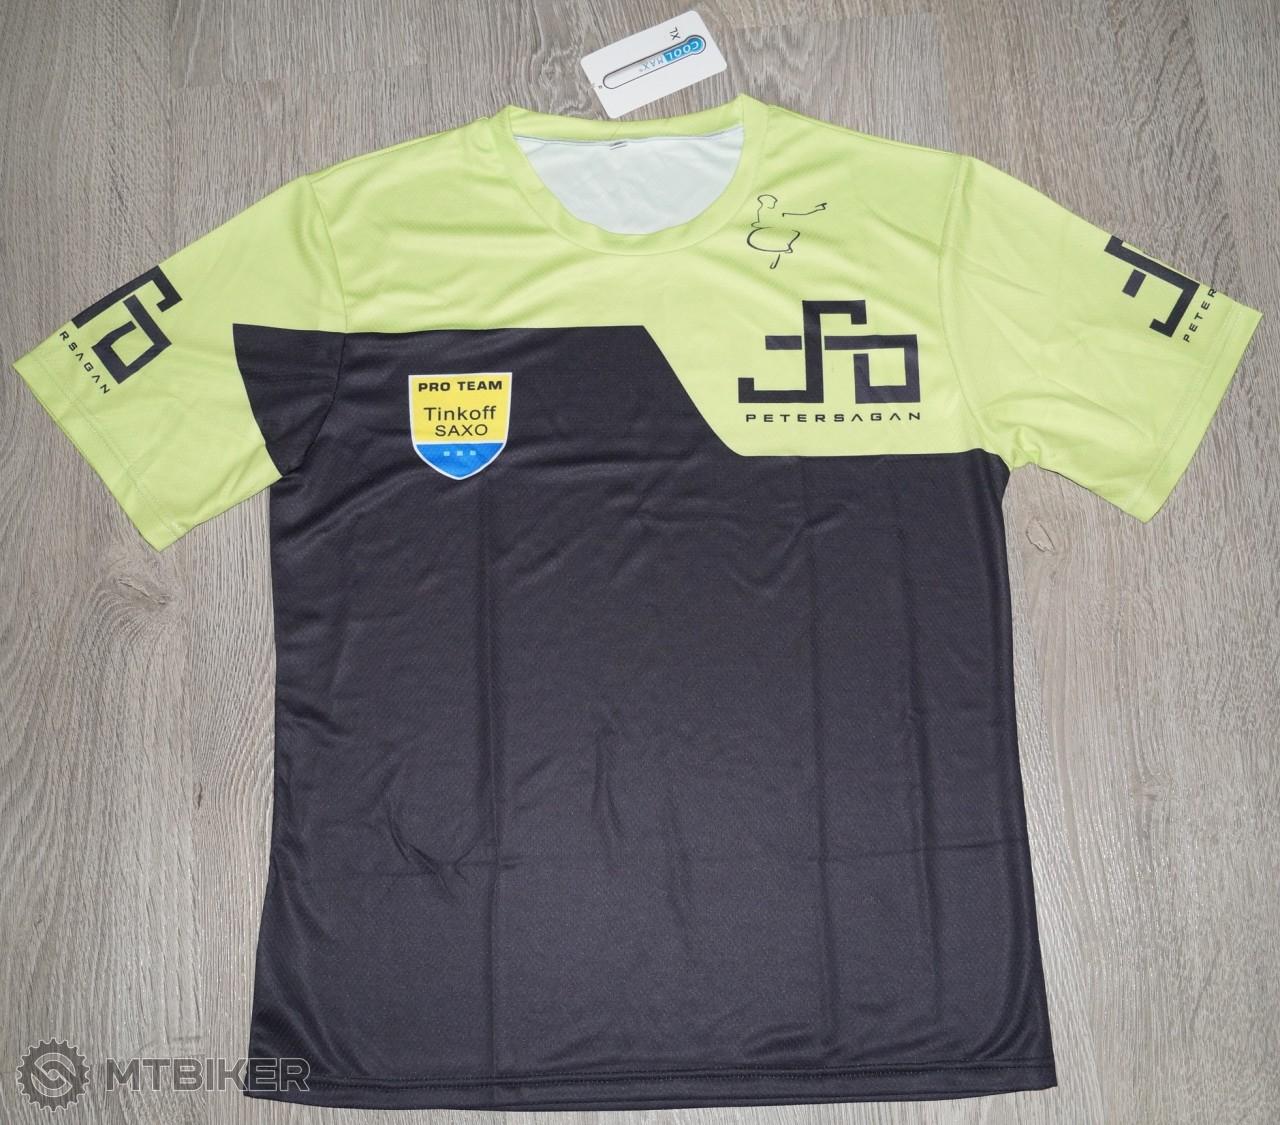 ad2d0f9723991 Tričko Peter Sagan, Tinkoff Saxo Pro Team - Príslušenstvo - Oblečenie a  batohy - Bazár MTBIKER